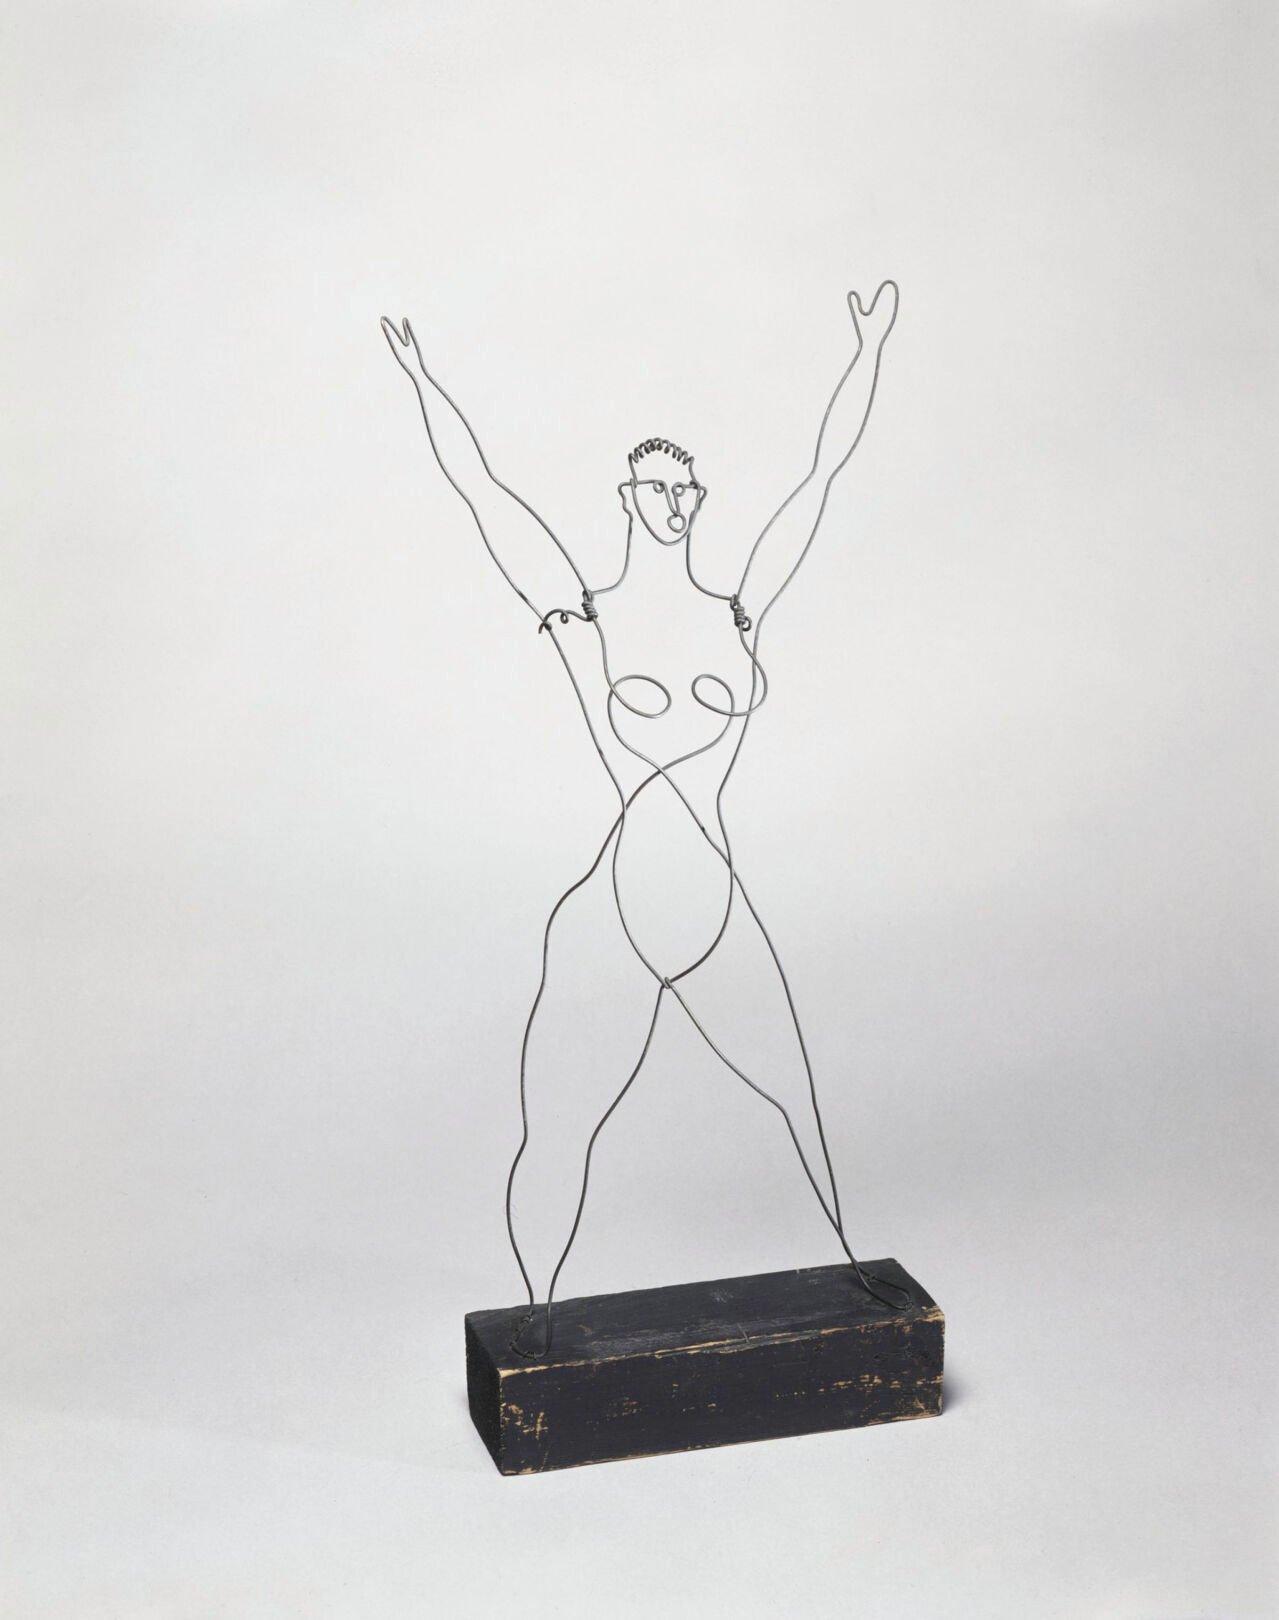 062321_MNS_Calder_Picasso_003 Alexander Calder Acrobat